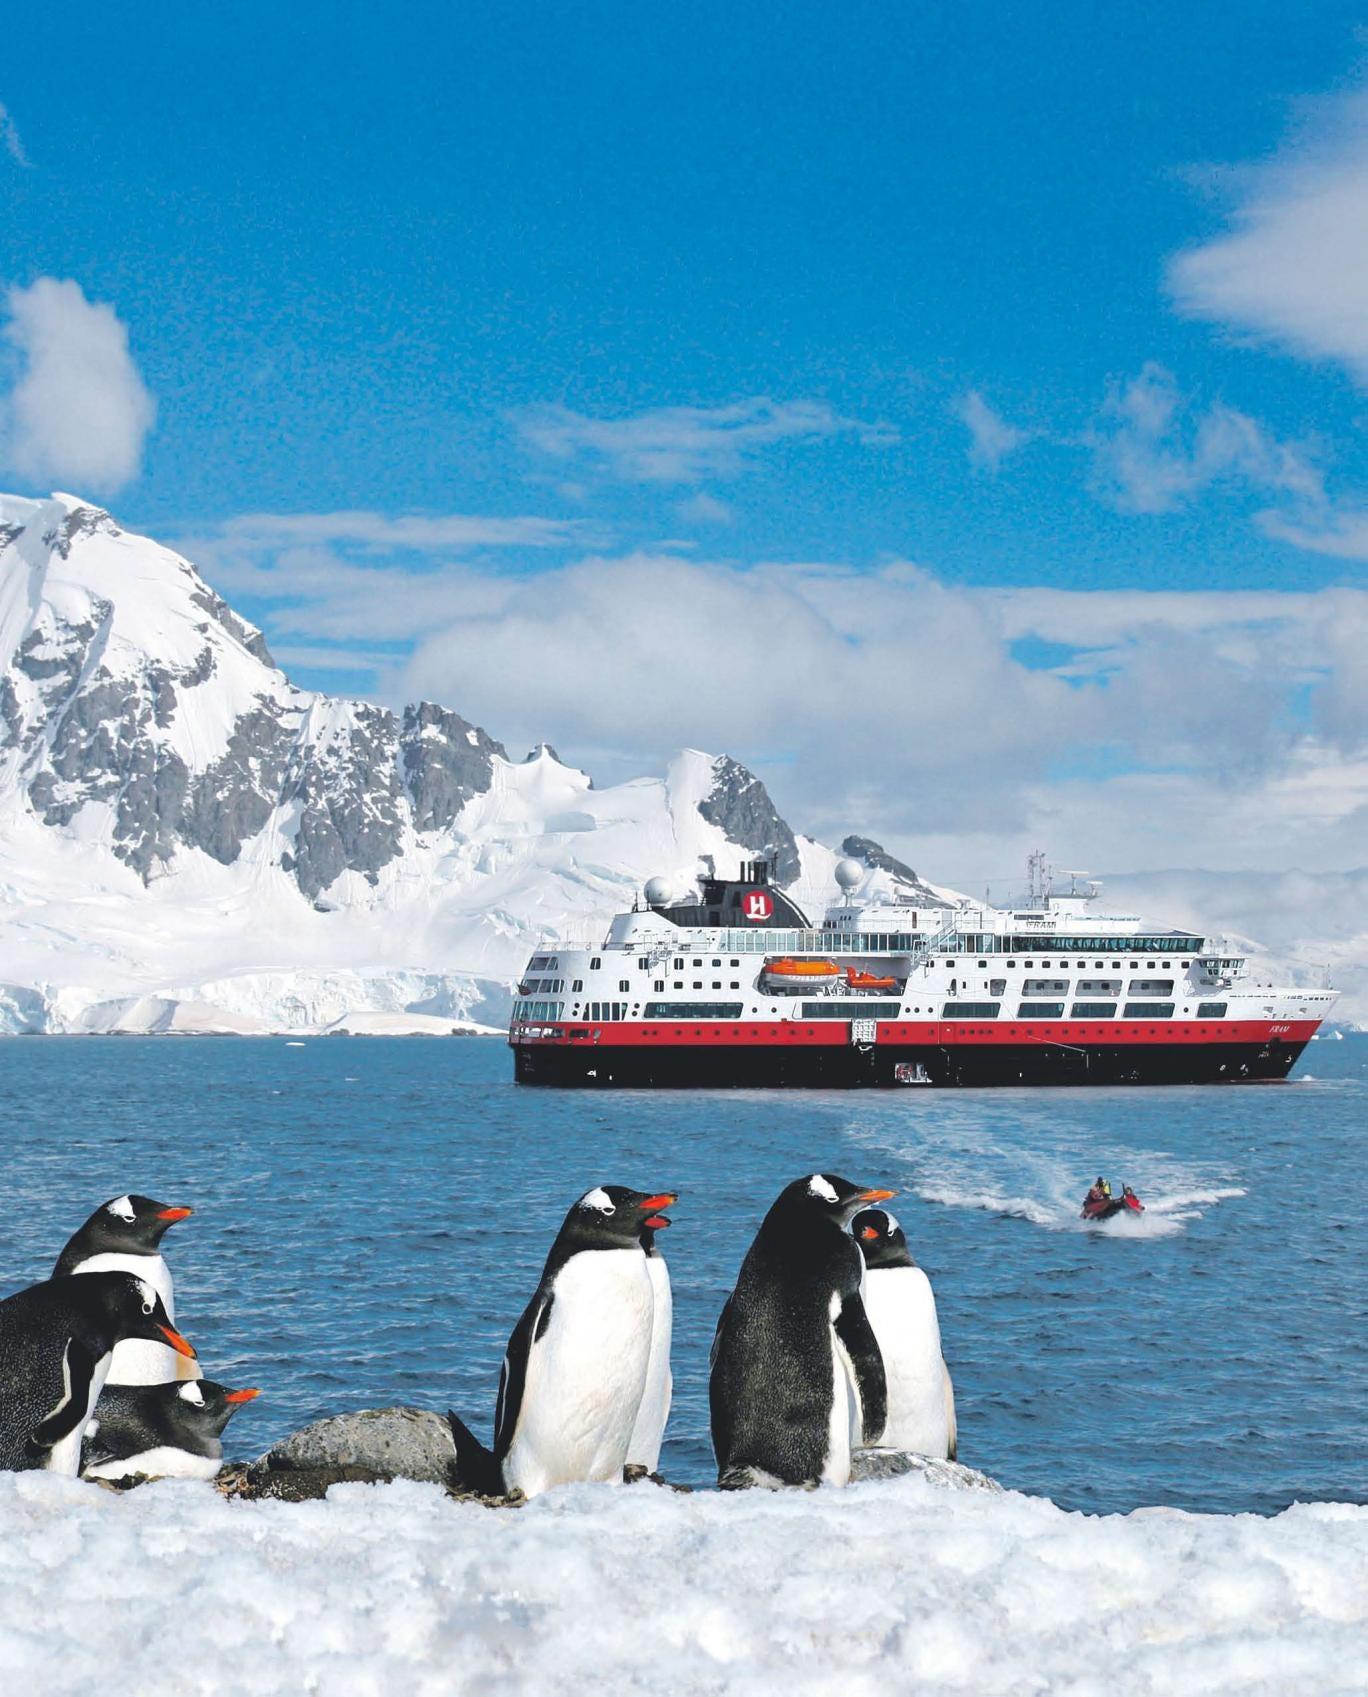 Camp for a night in Antarctica with Hurtigruten